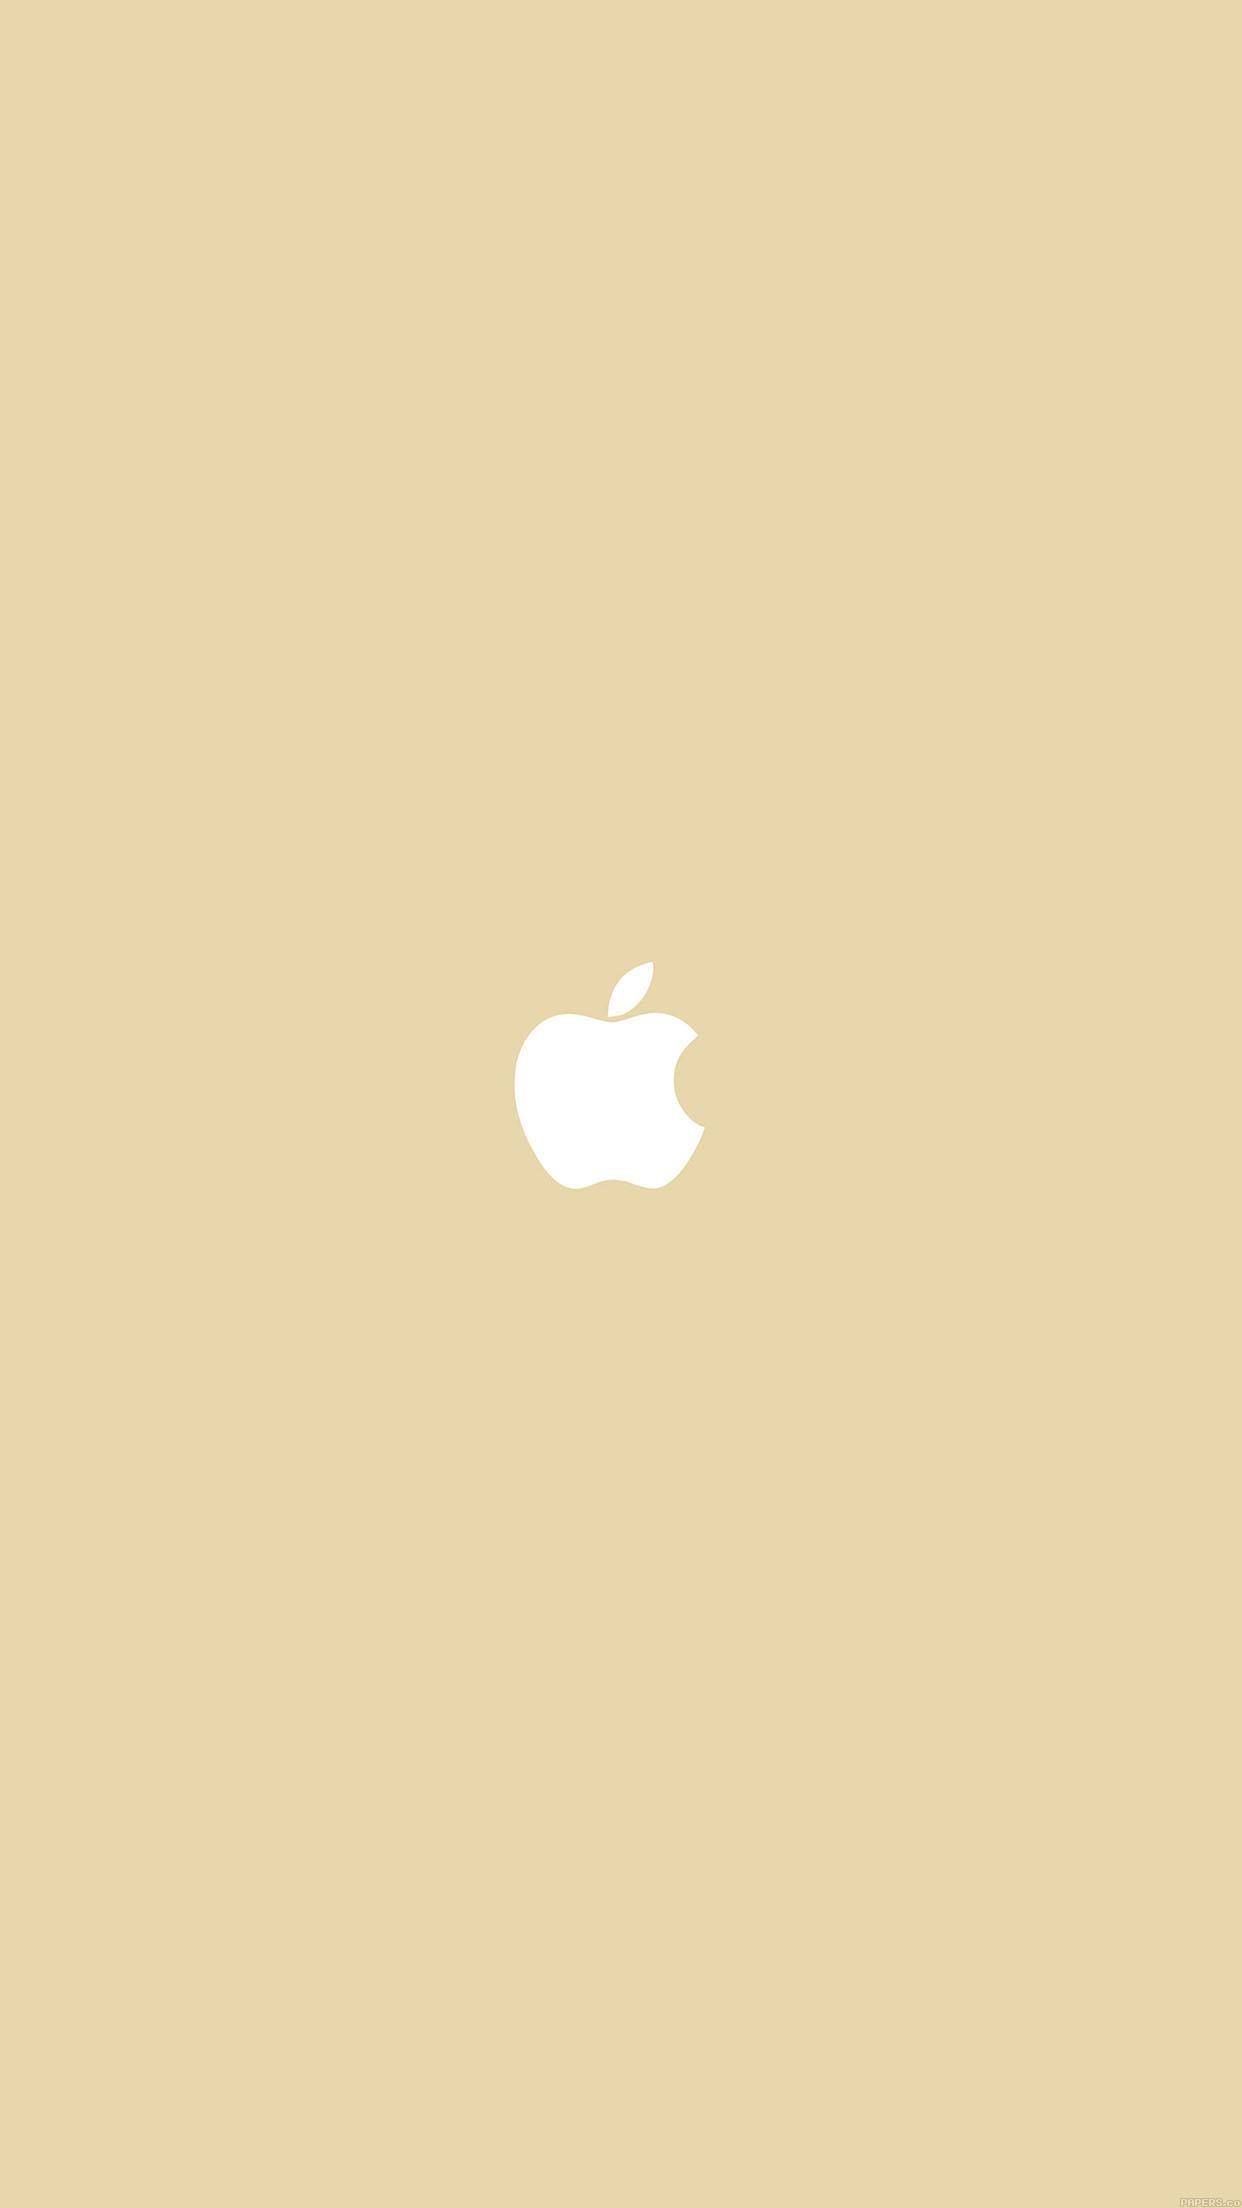 Simple Apple Logo Gold Minimal